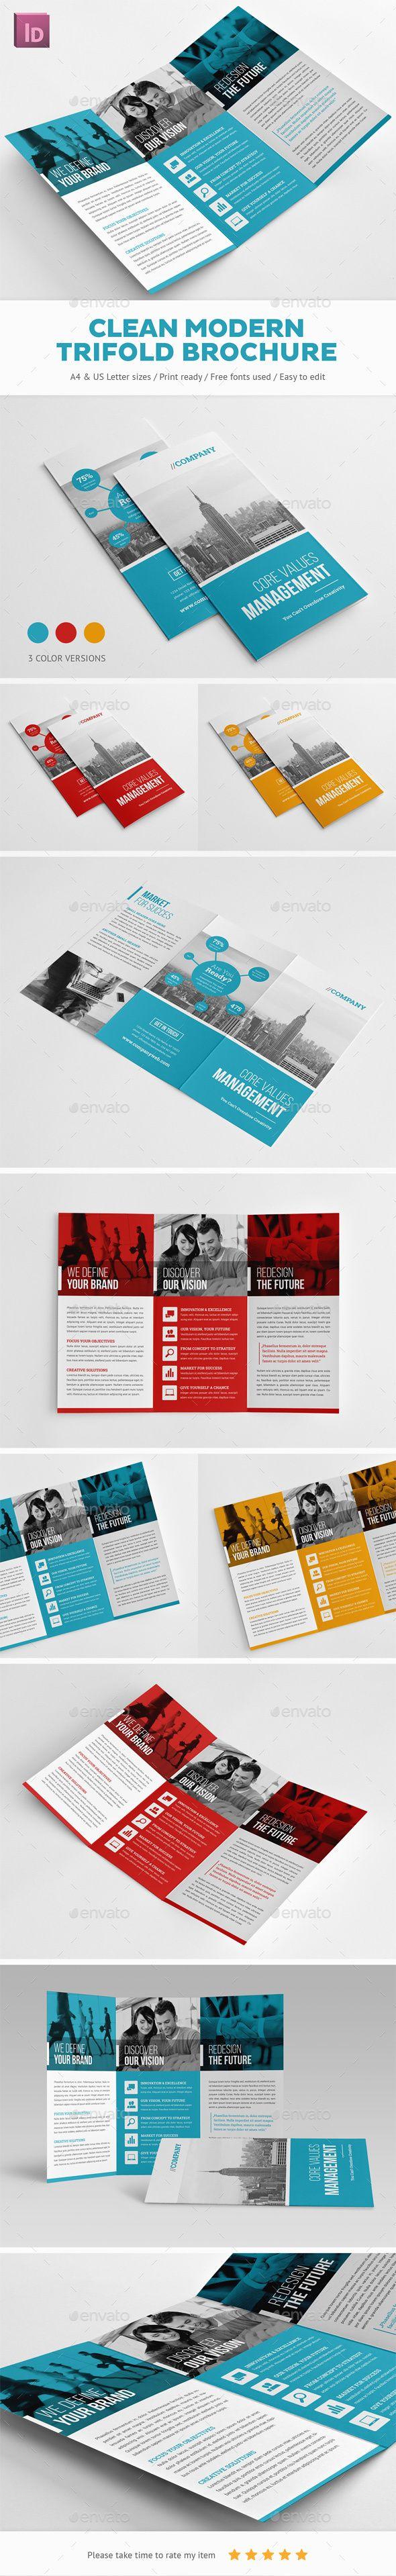 Clean Modern Trifold Brochure - Corporate Brochures